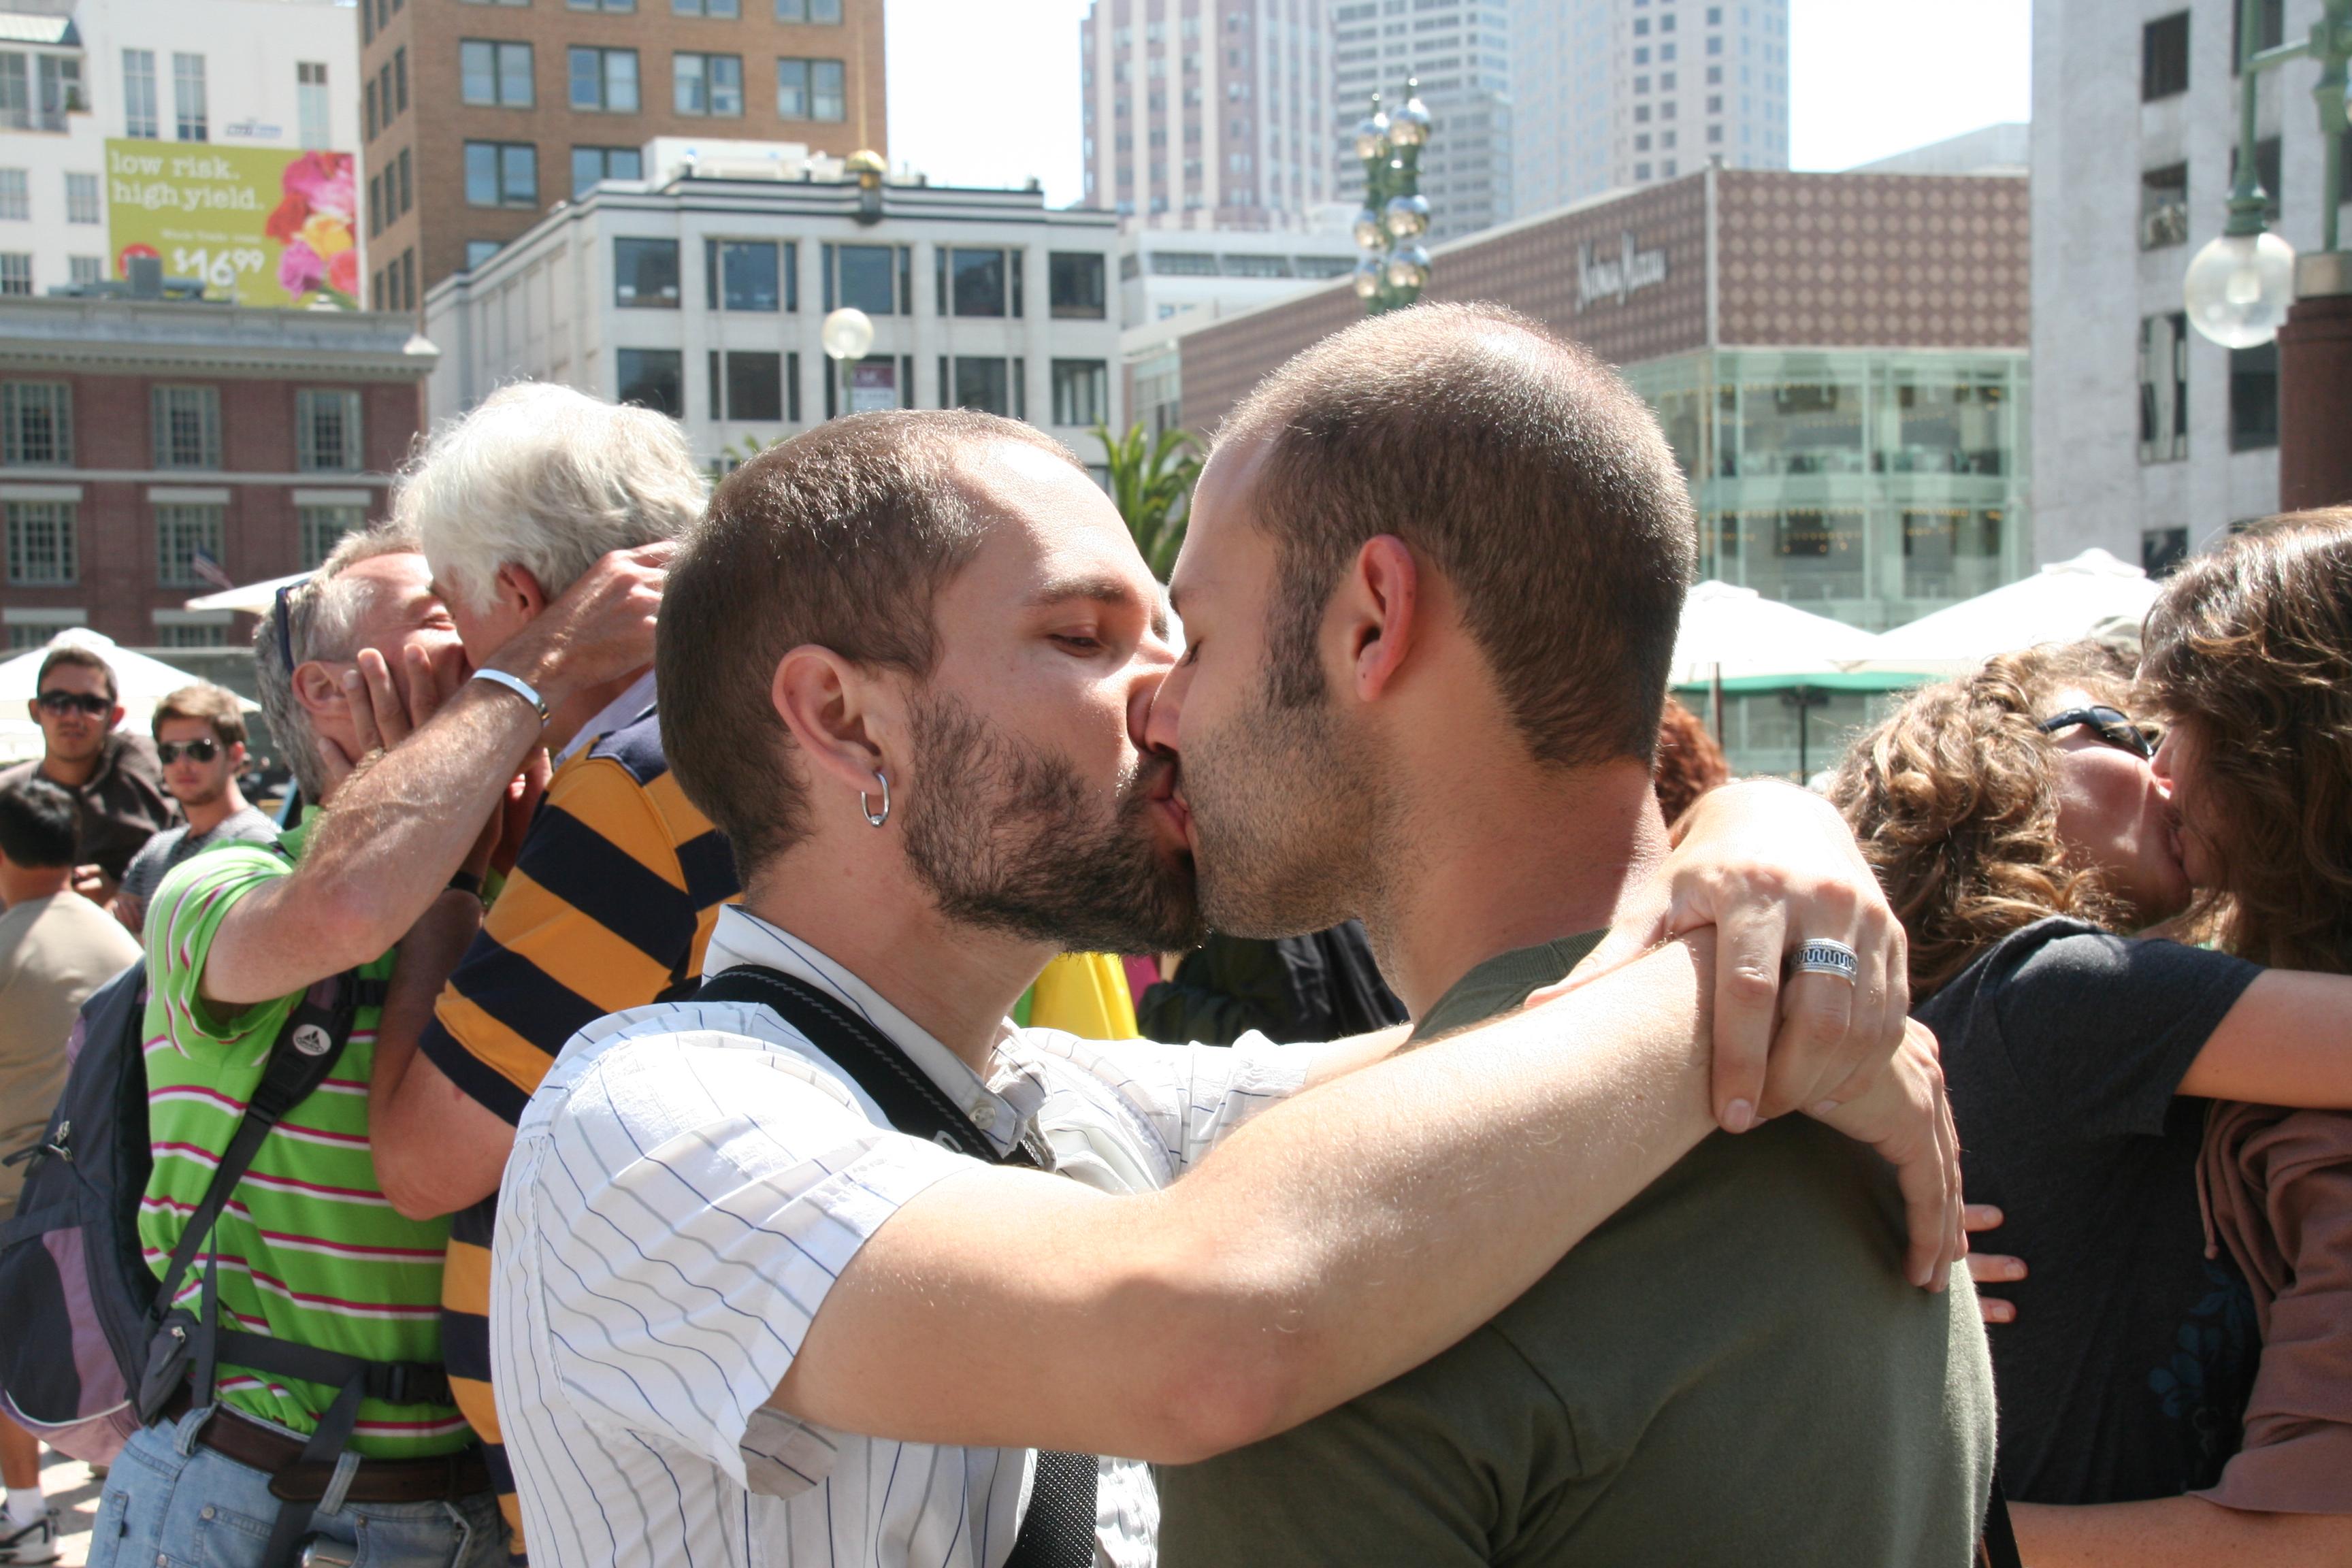 Une culture de tolérance. | Photo par Bill Taroli